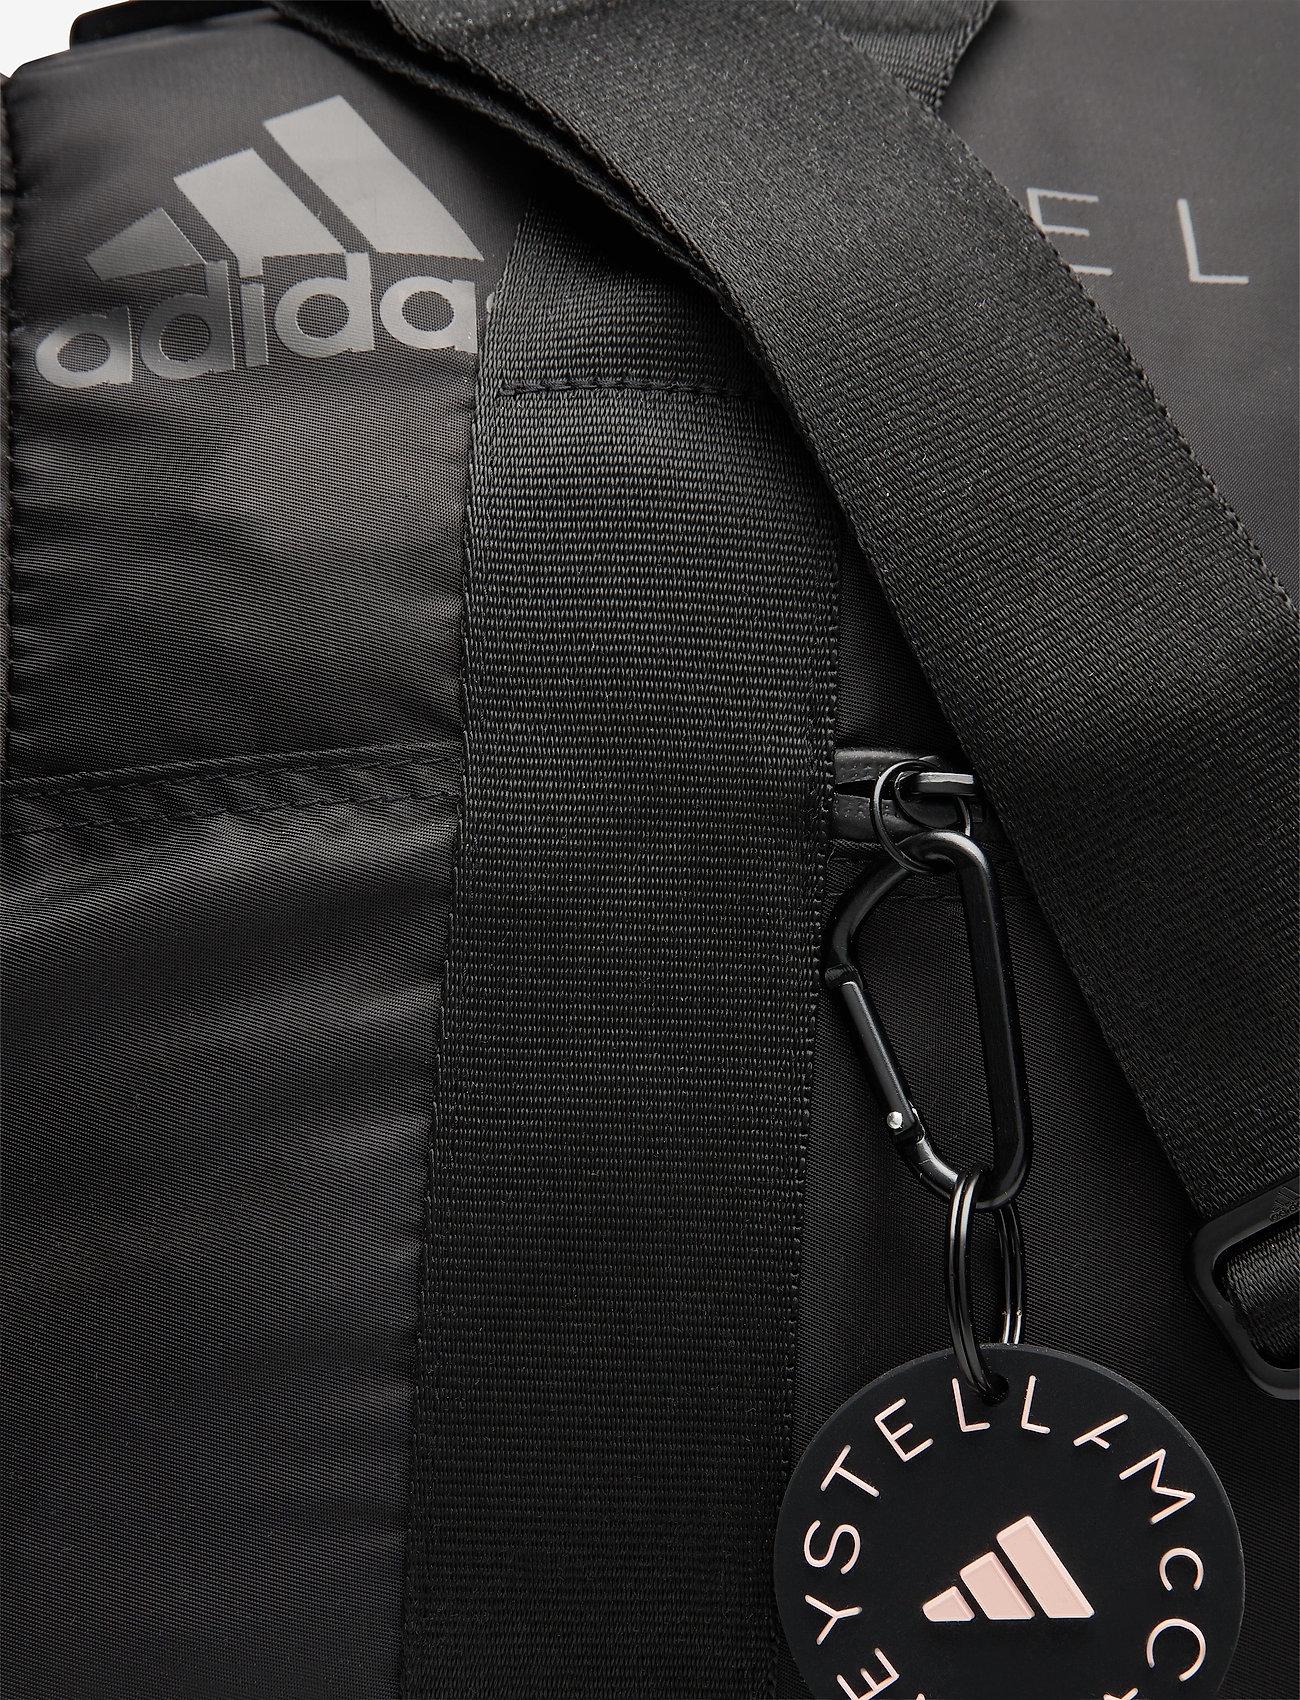 adidas by Stella McCartney - Squared Studio Bag W - gym bags - black/matblk/black - 3